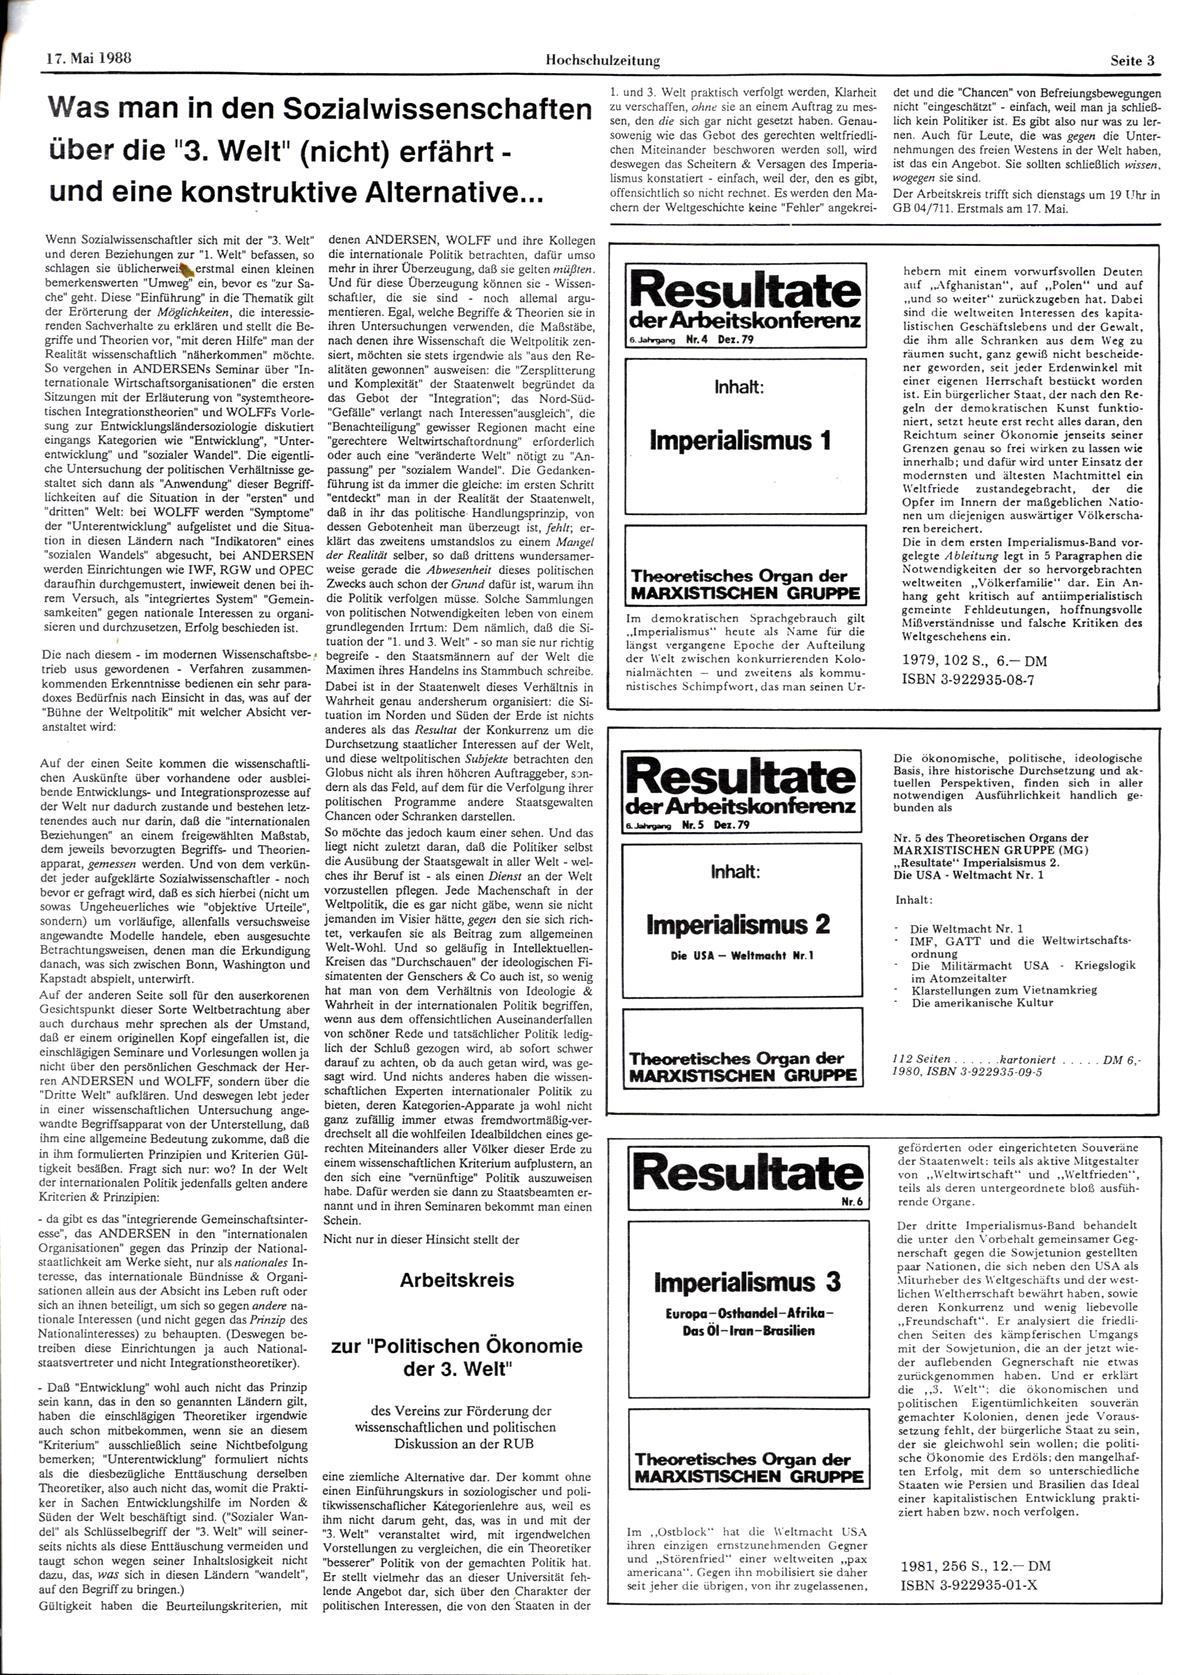 Bochum_BHZ_19880517_169_003